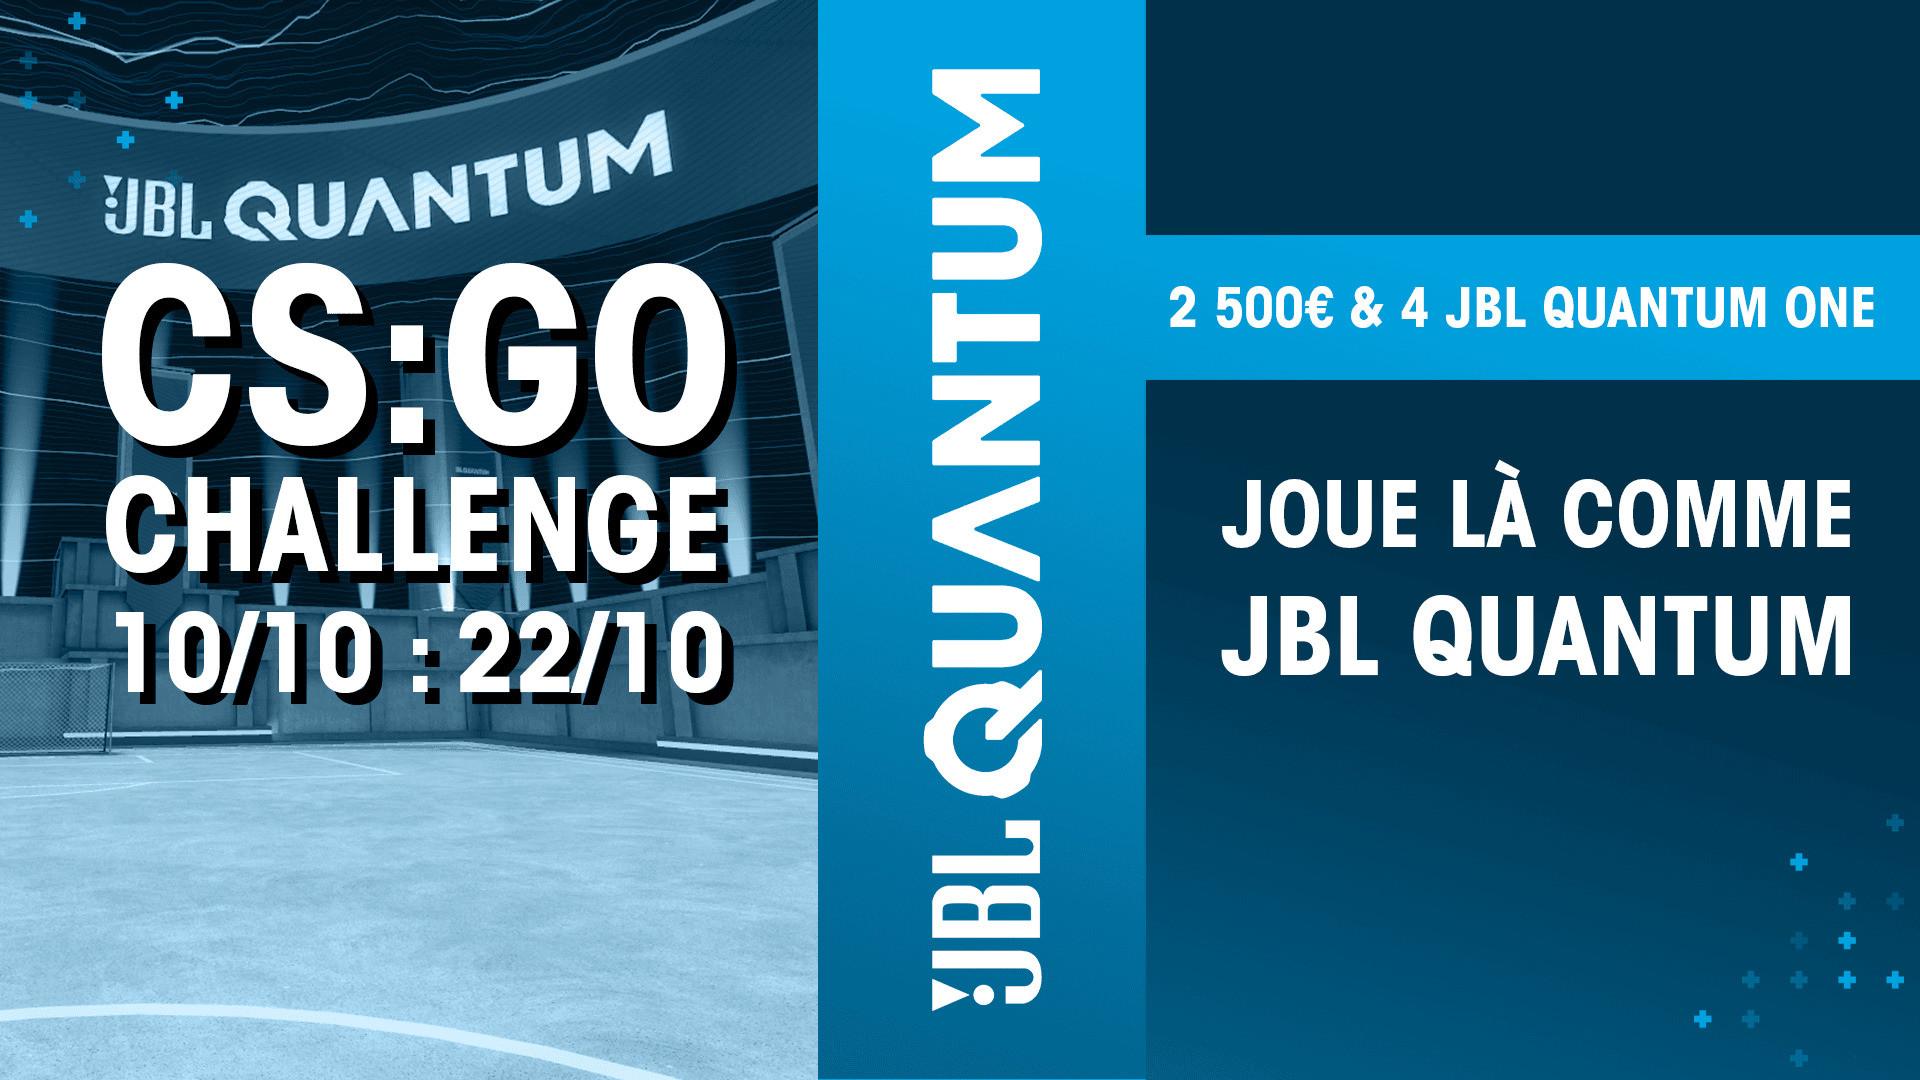 JBL Quantum CS:GO : Challenge #2